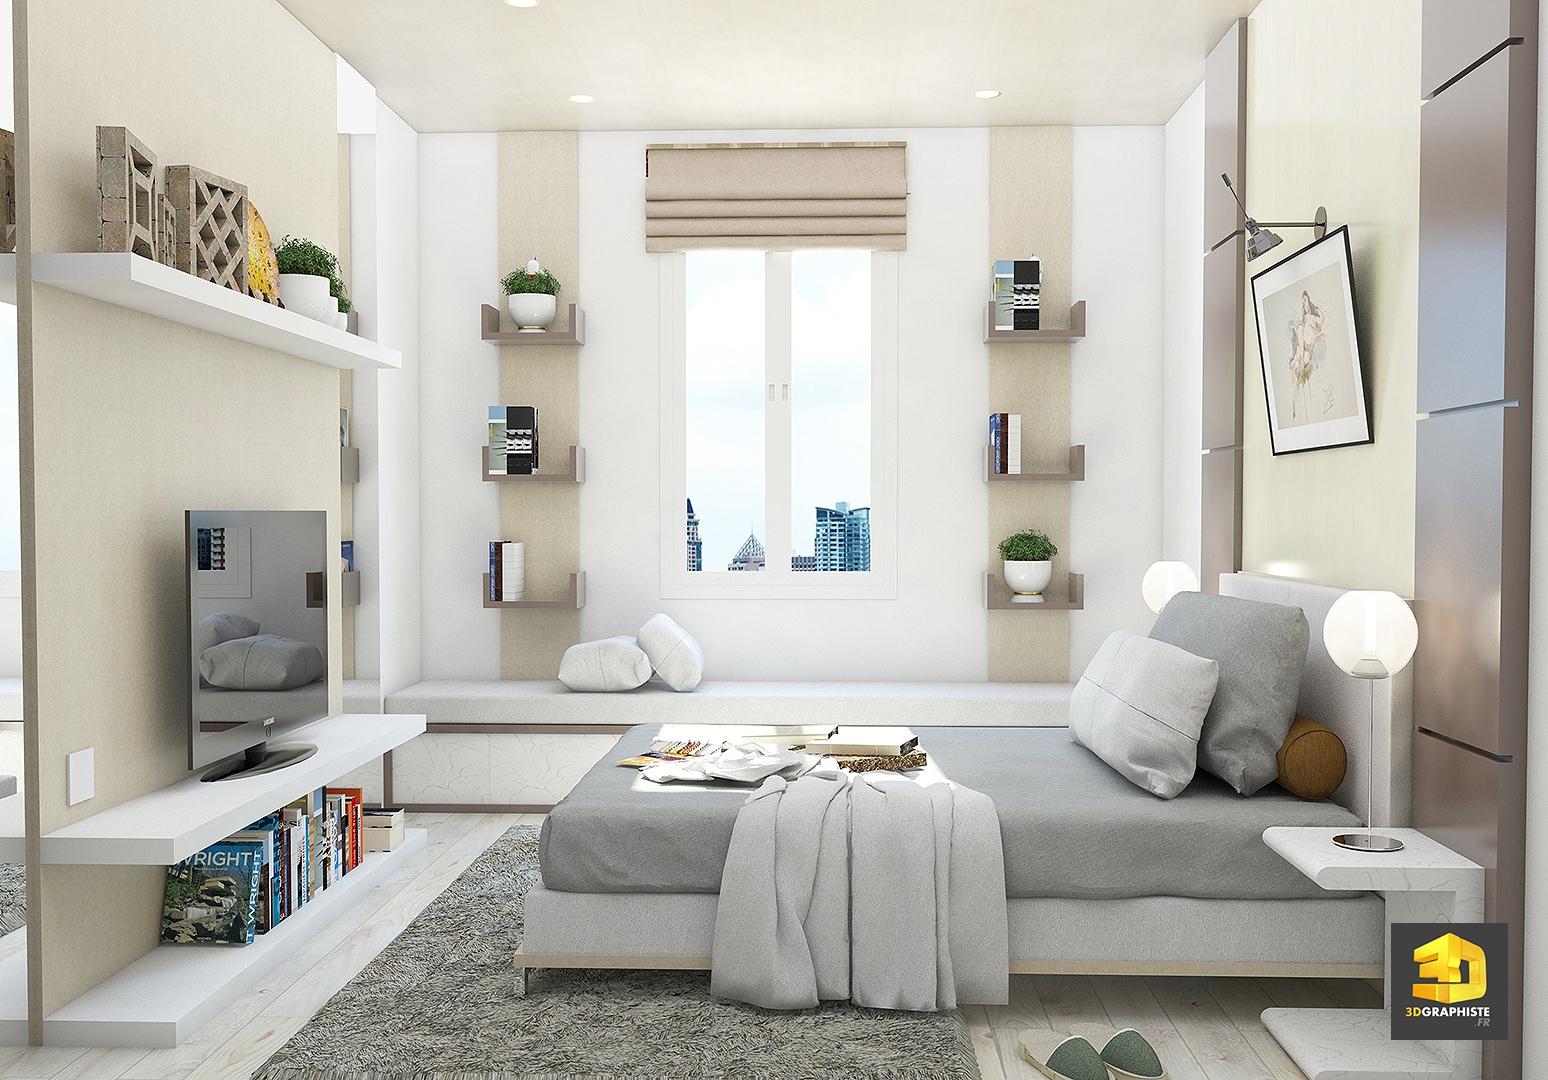 Perspectives d 39 int rieur d 39 appartement chambre coucher for Chambre a coucher 3d